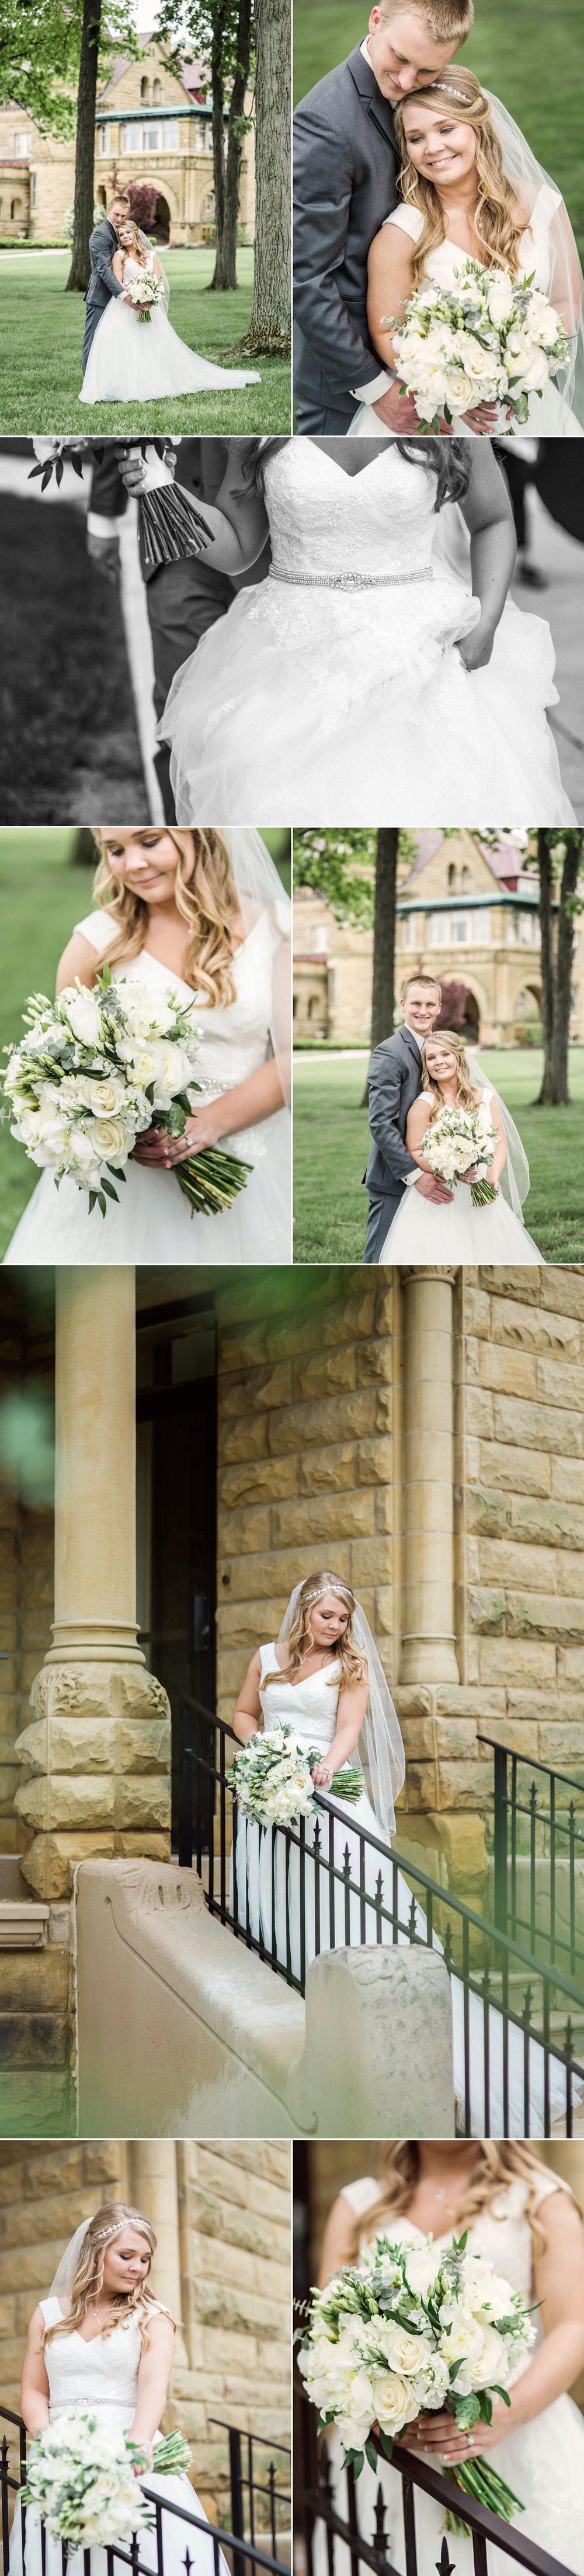 bride - flowers - bouquet - fort wayne - indiana